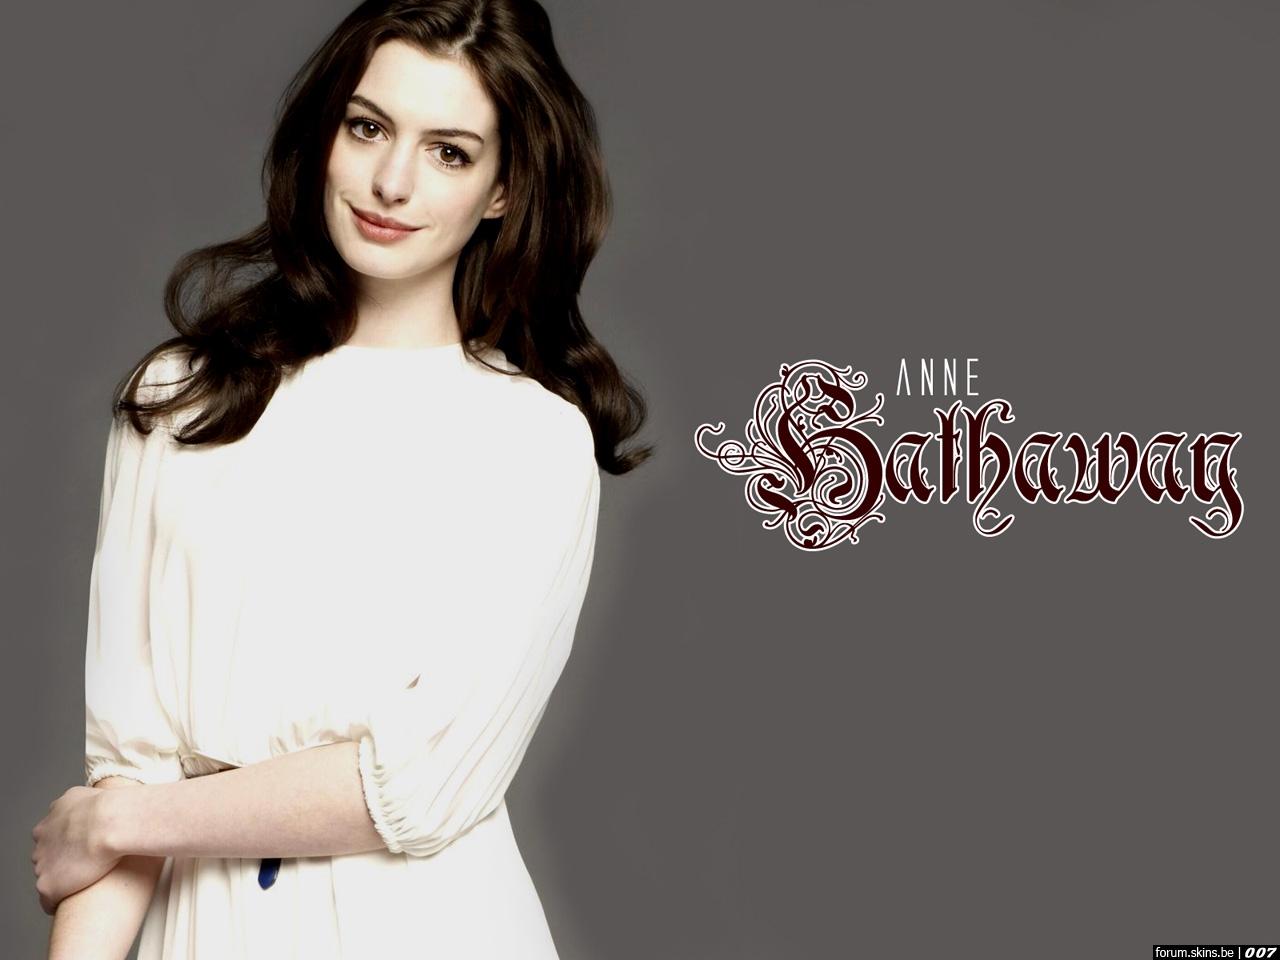 Anne Hathaway wallpaper (#31271)